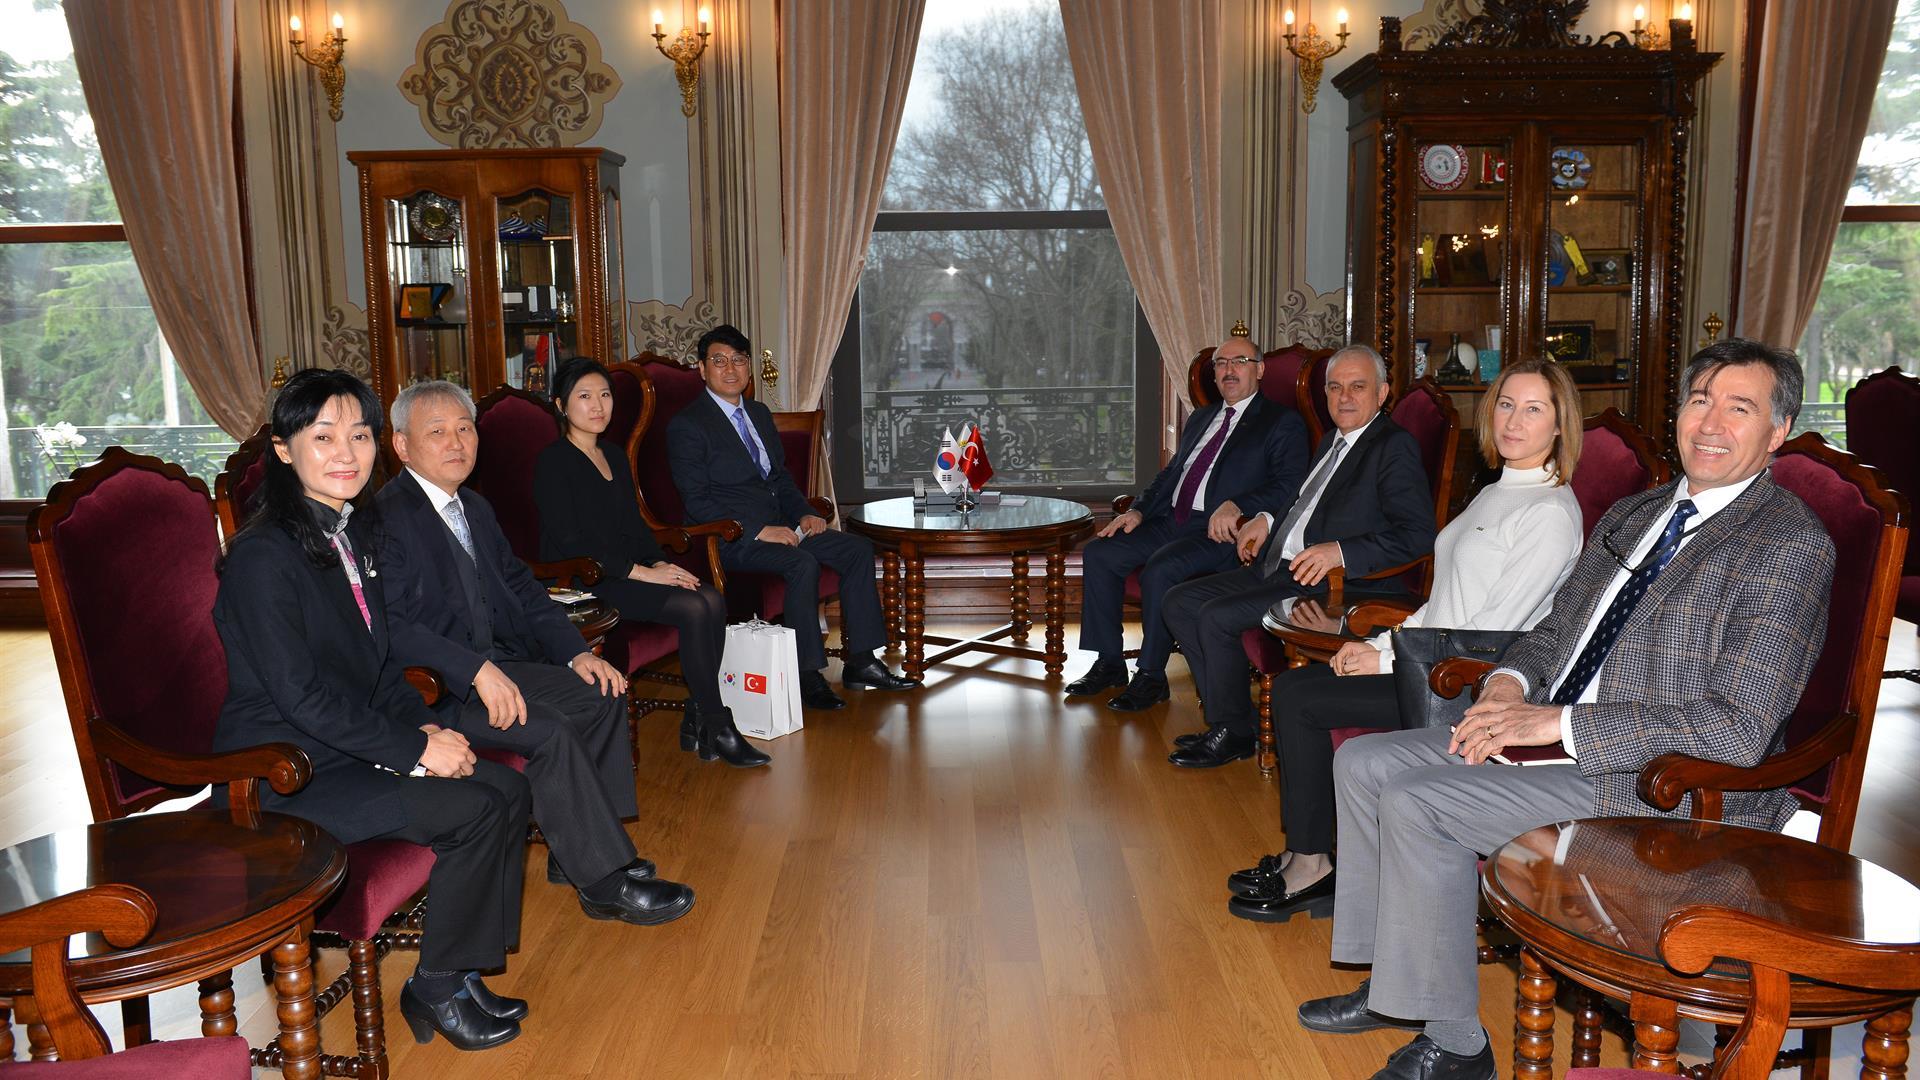 Kore-Vekil-Başkonsolosu-Byung-Jun-Moon-İstanbul-Üniversitesi'ni-Ziyaret-Etti